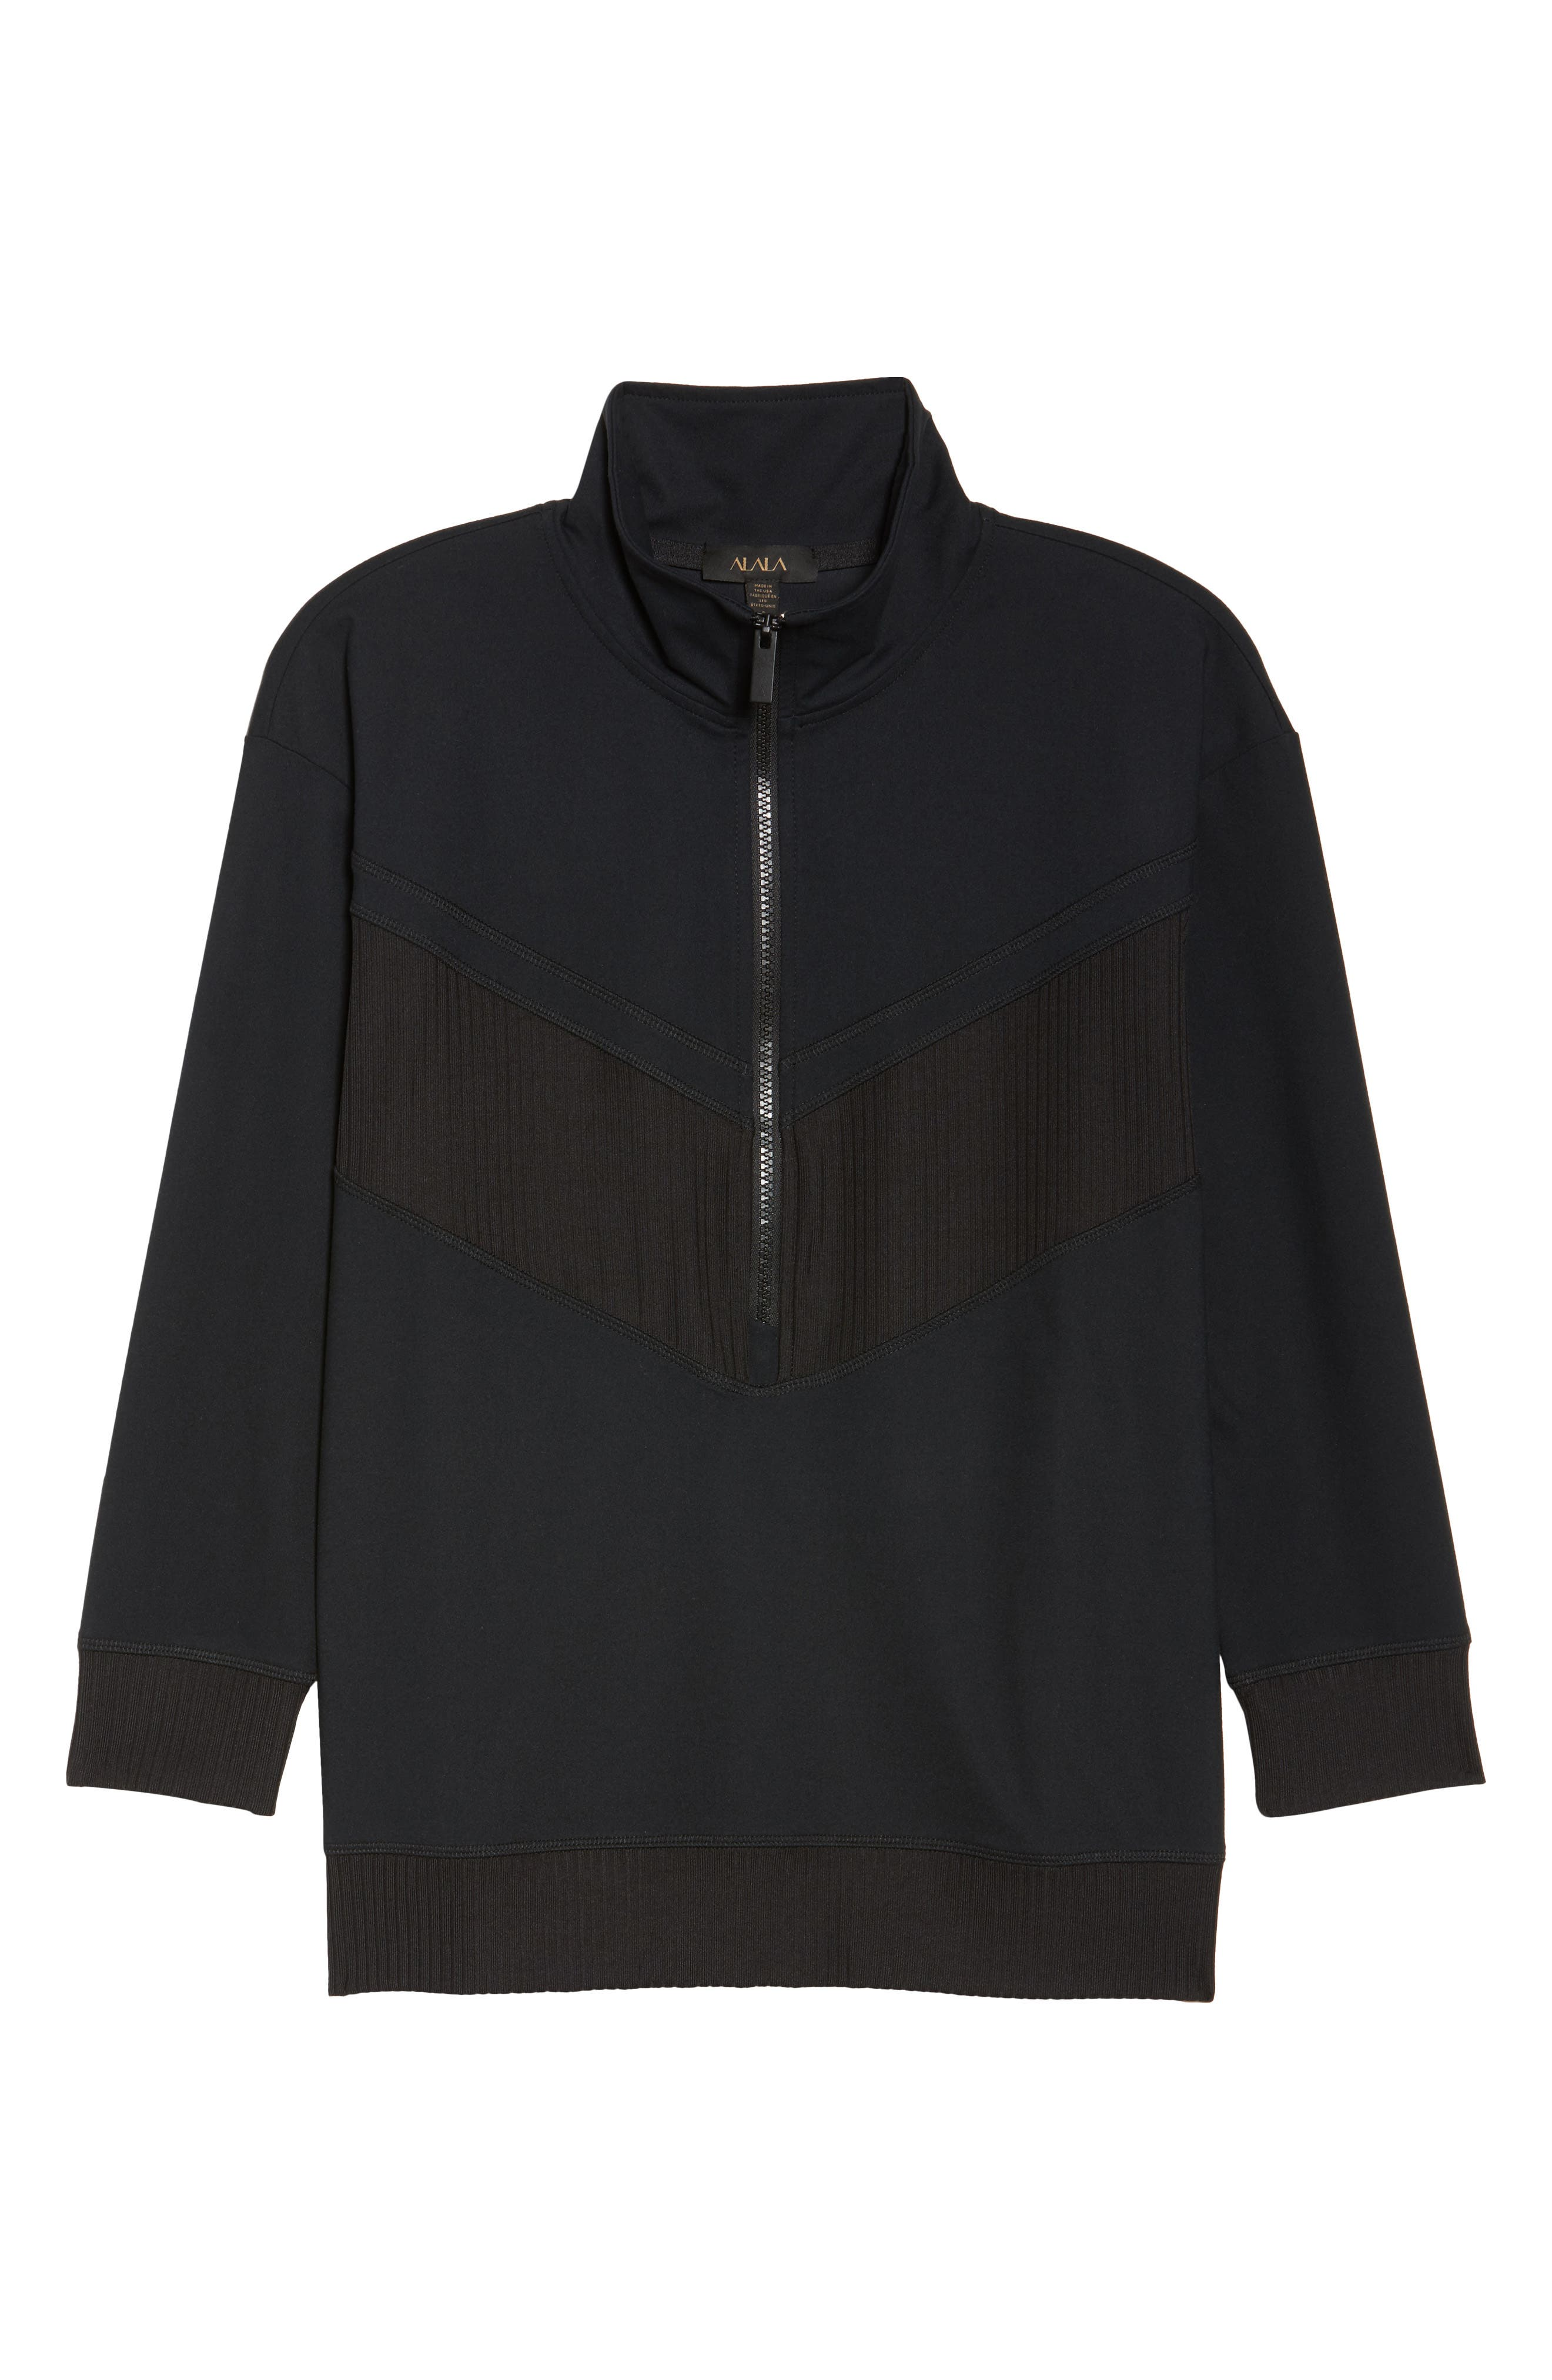 Cato Quarter Zip Pullover,                             Alternate thumbnail 7, color,                             Black